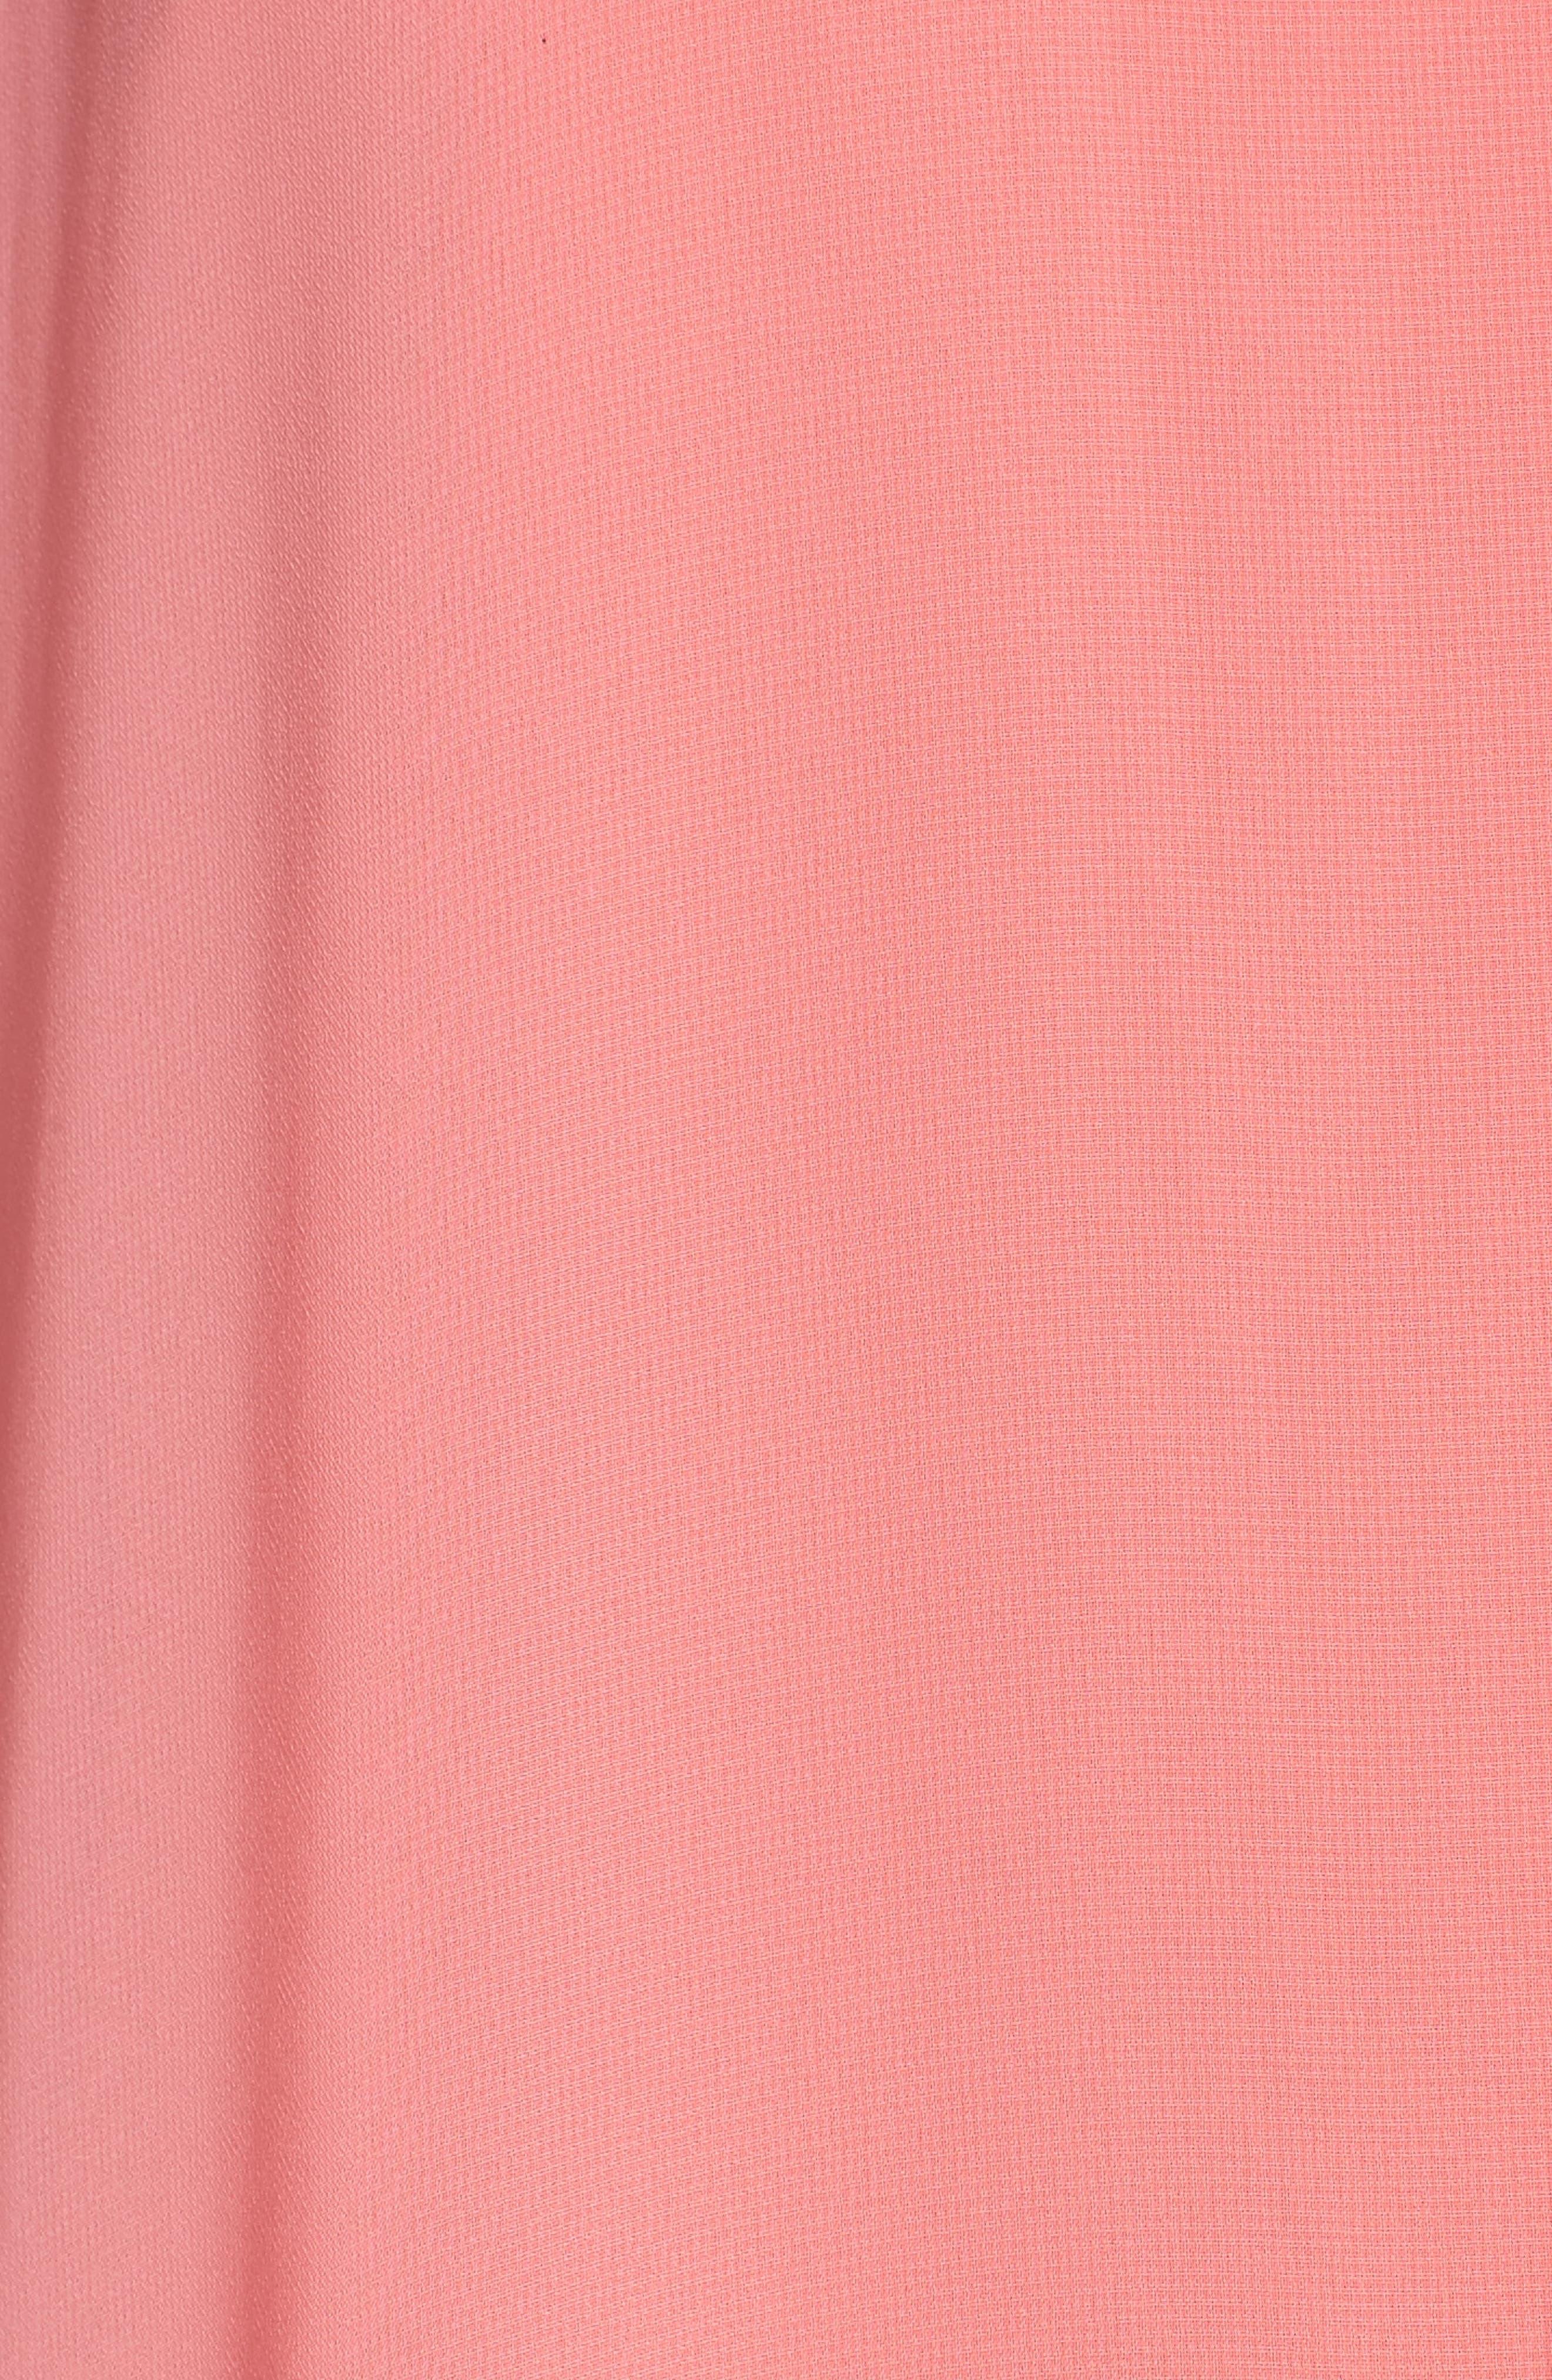 Embellished Chiffon Overlay A-Line Dress,                             Alternate thumbnail 5, color,                             651